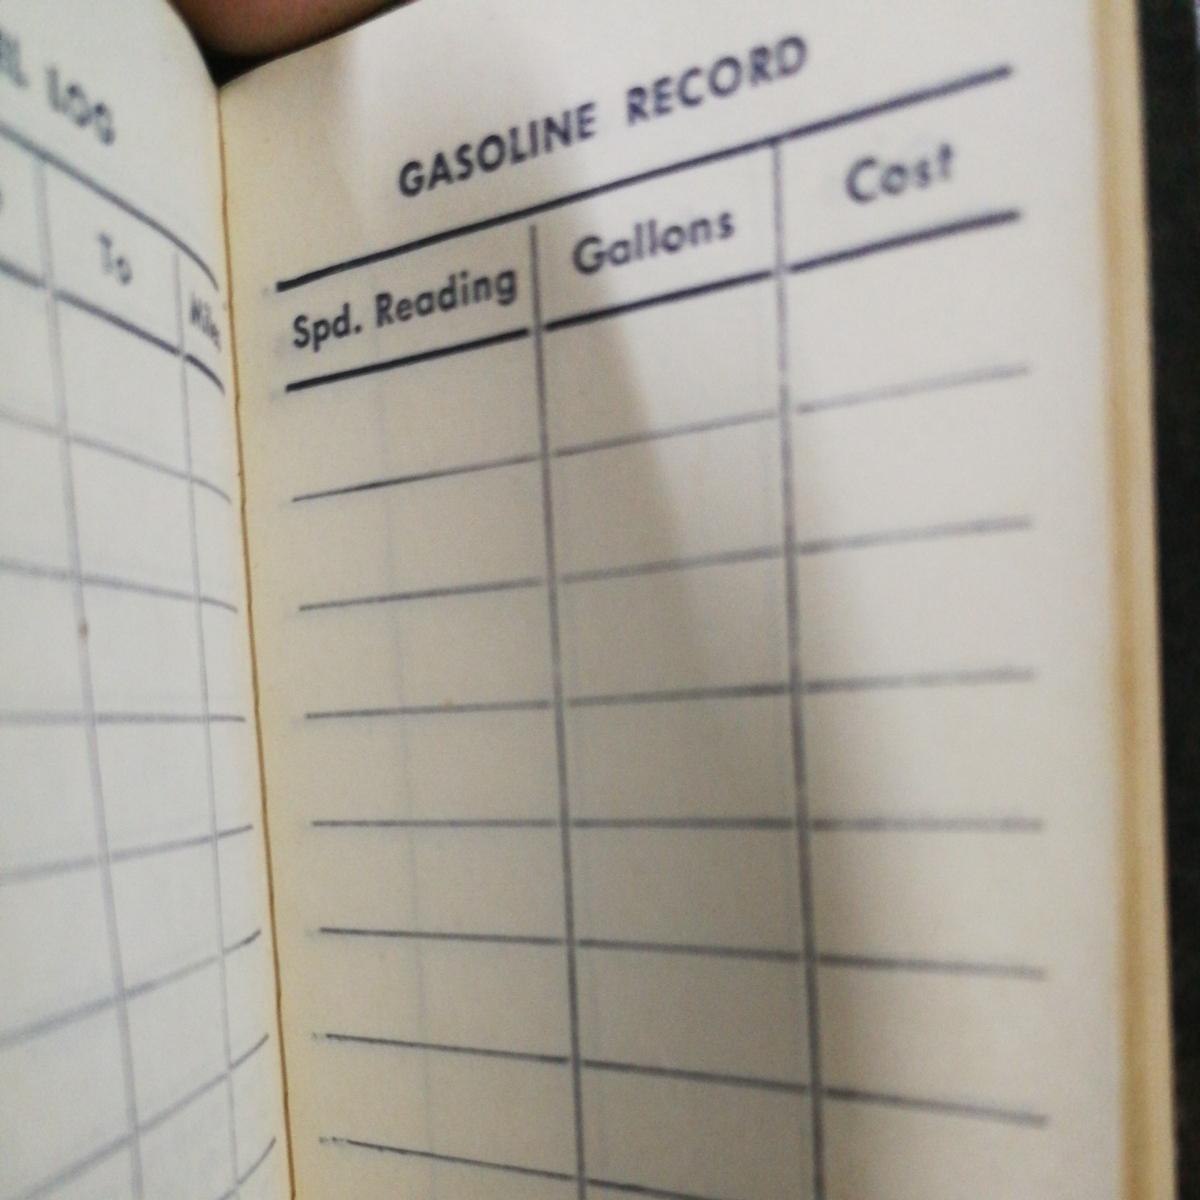 aaa charlies auto service 記録帳 1955年当時 ヤフオク